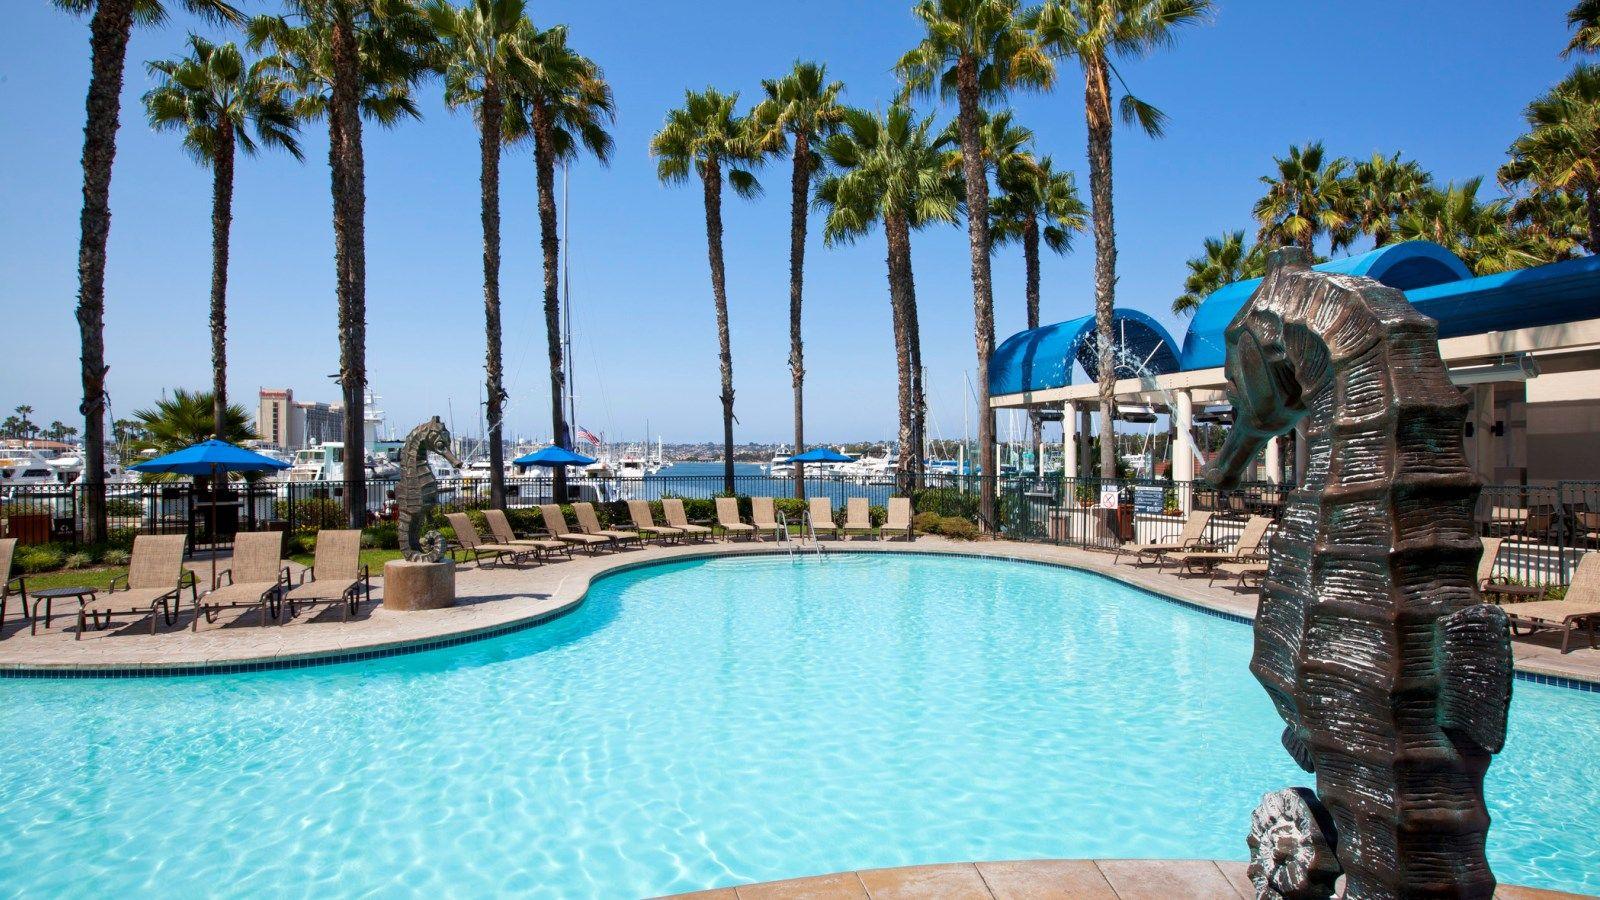 Sheraton San Go Hotel And Marina Lagoon Pool Places To